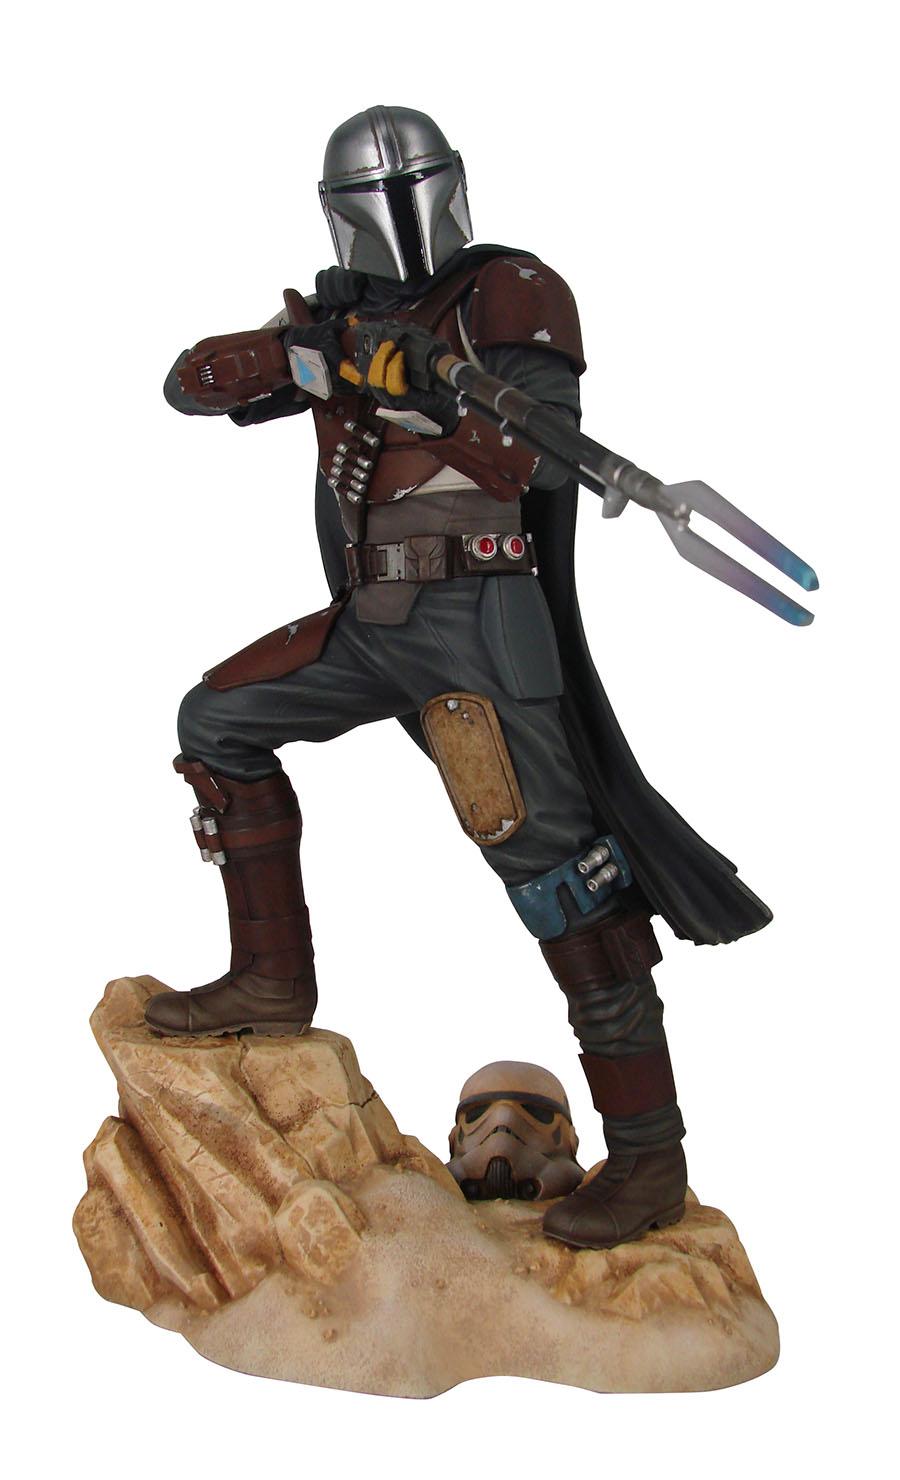 Star Wars Premier Collection The Mandalorian Mk1 1/7 Scale Statue